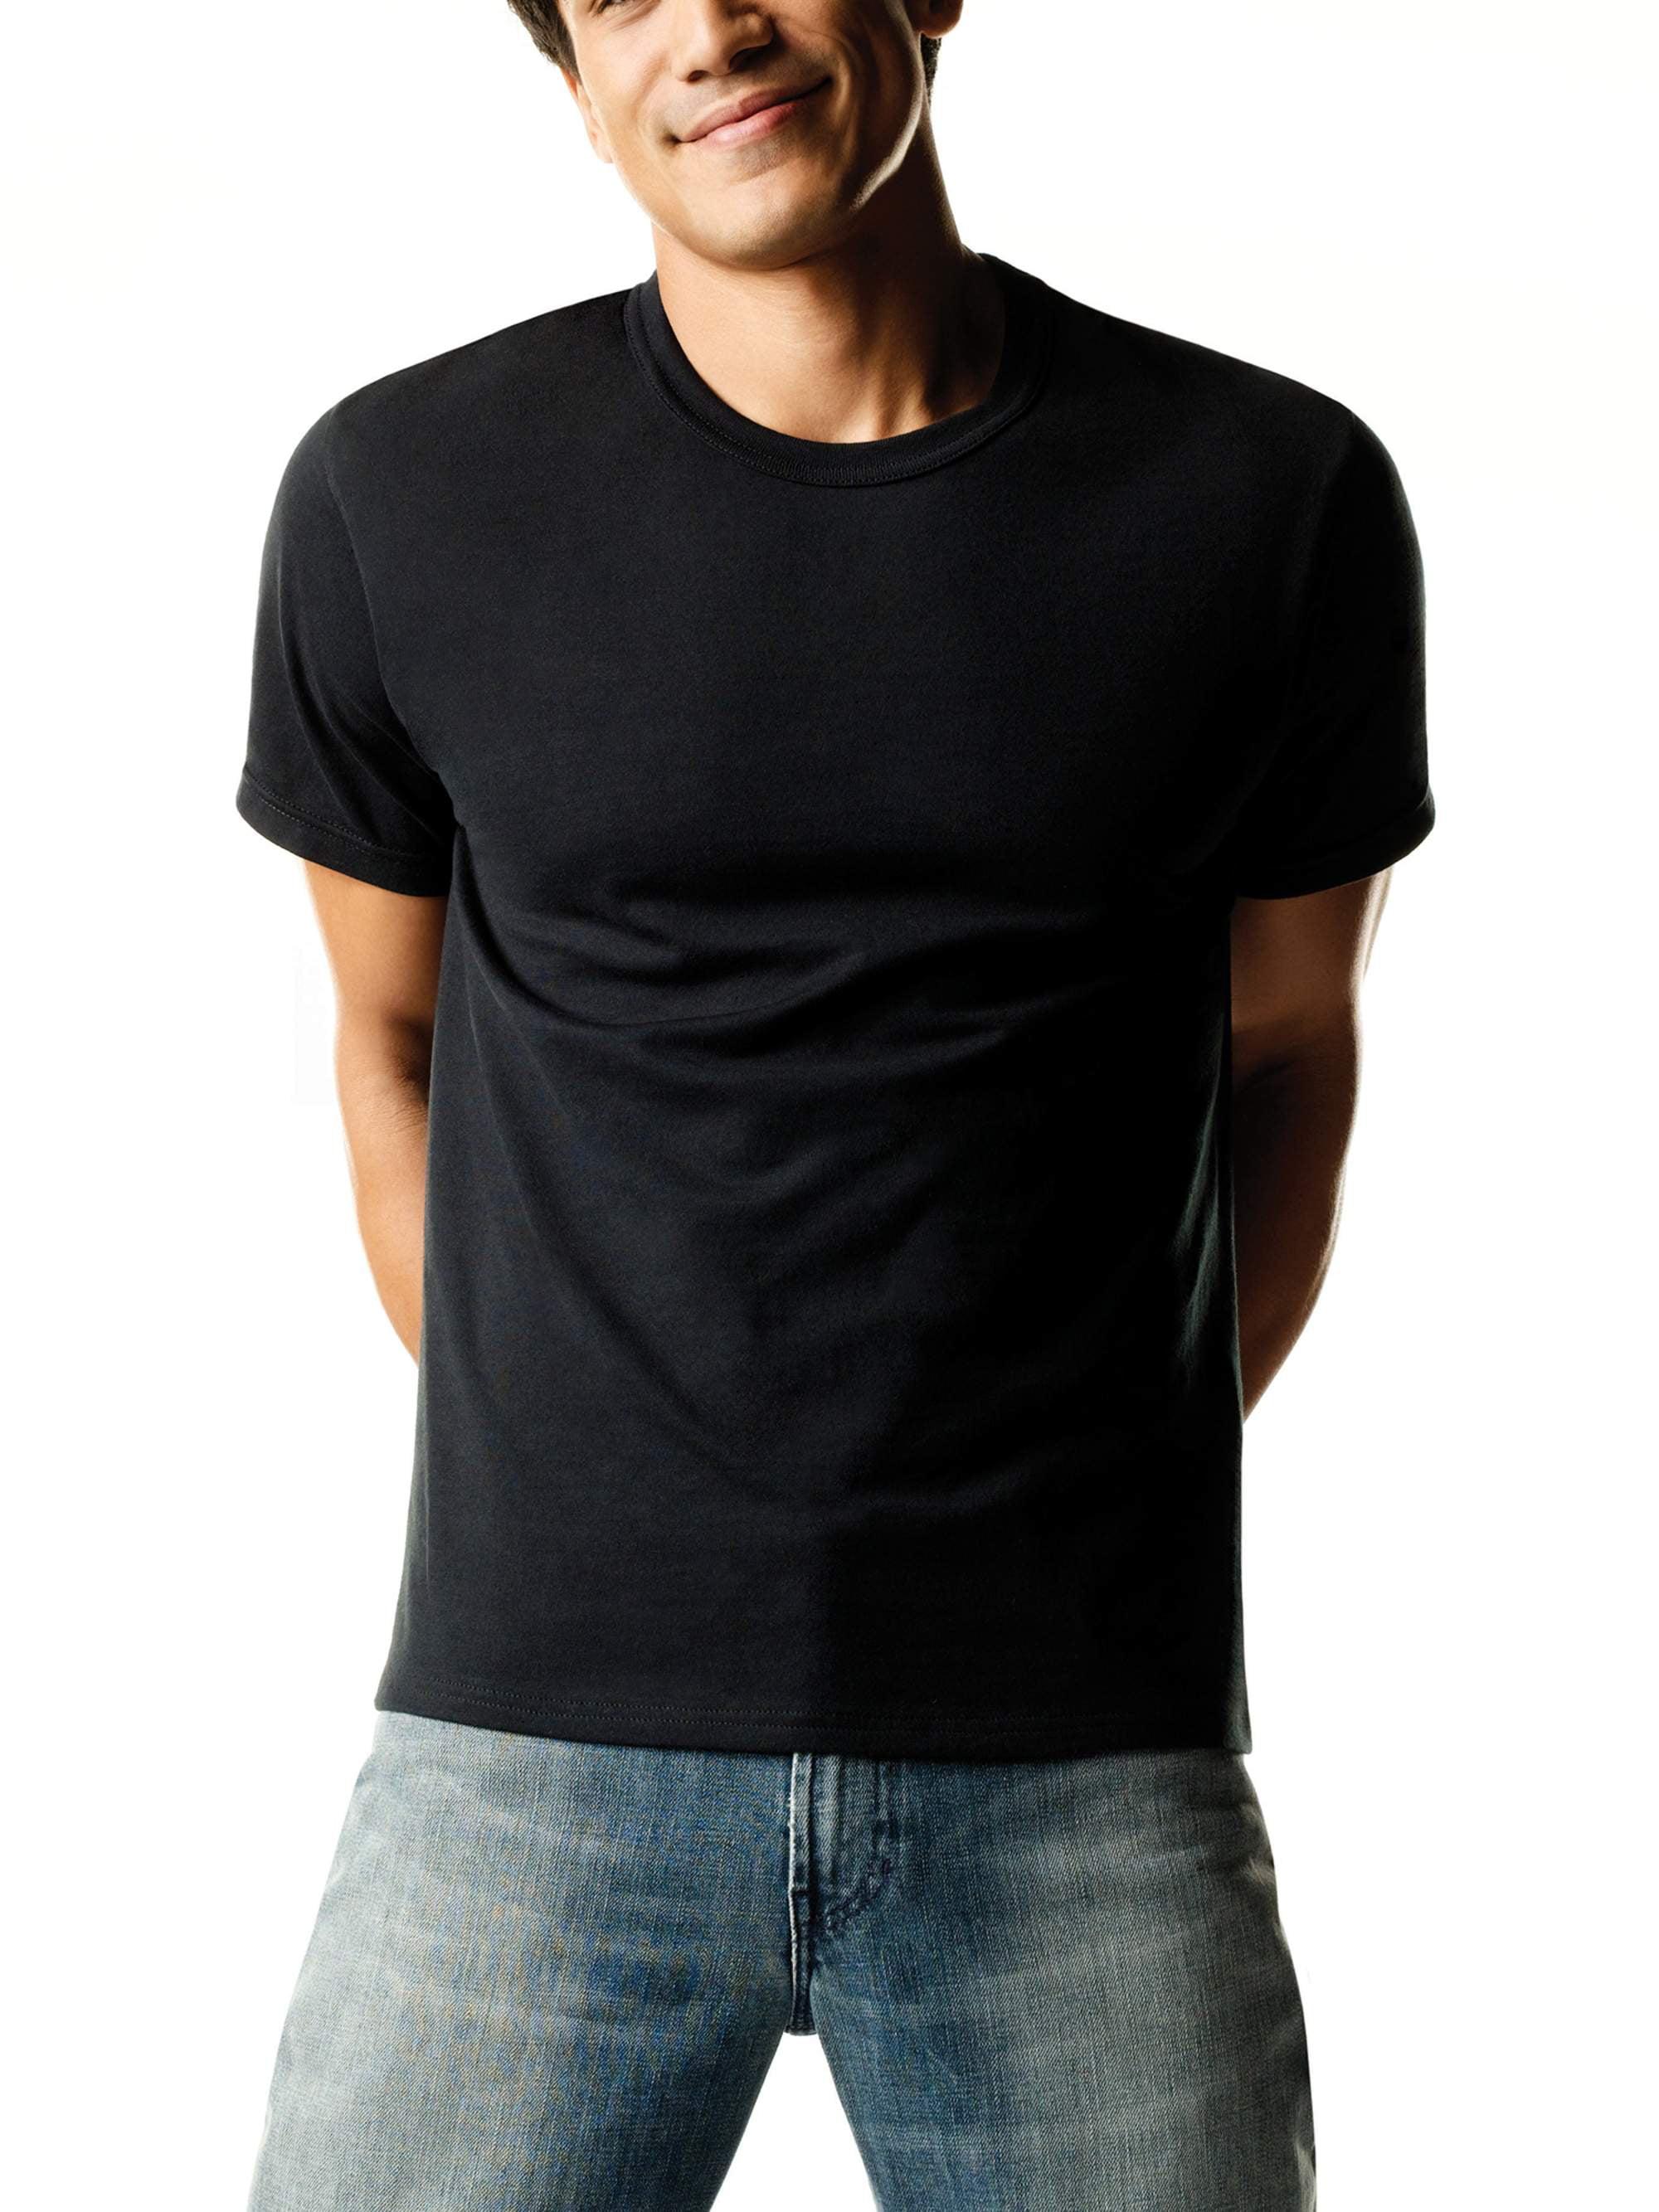 944ed4ba8 Hanes - Men's FreshIQ ComfortSoft Dyed Crew Neck T-Shirt 4-Pack ...